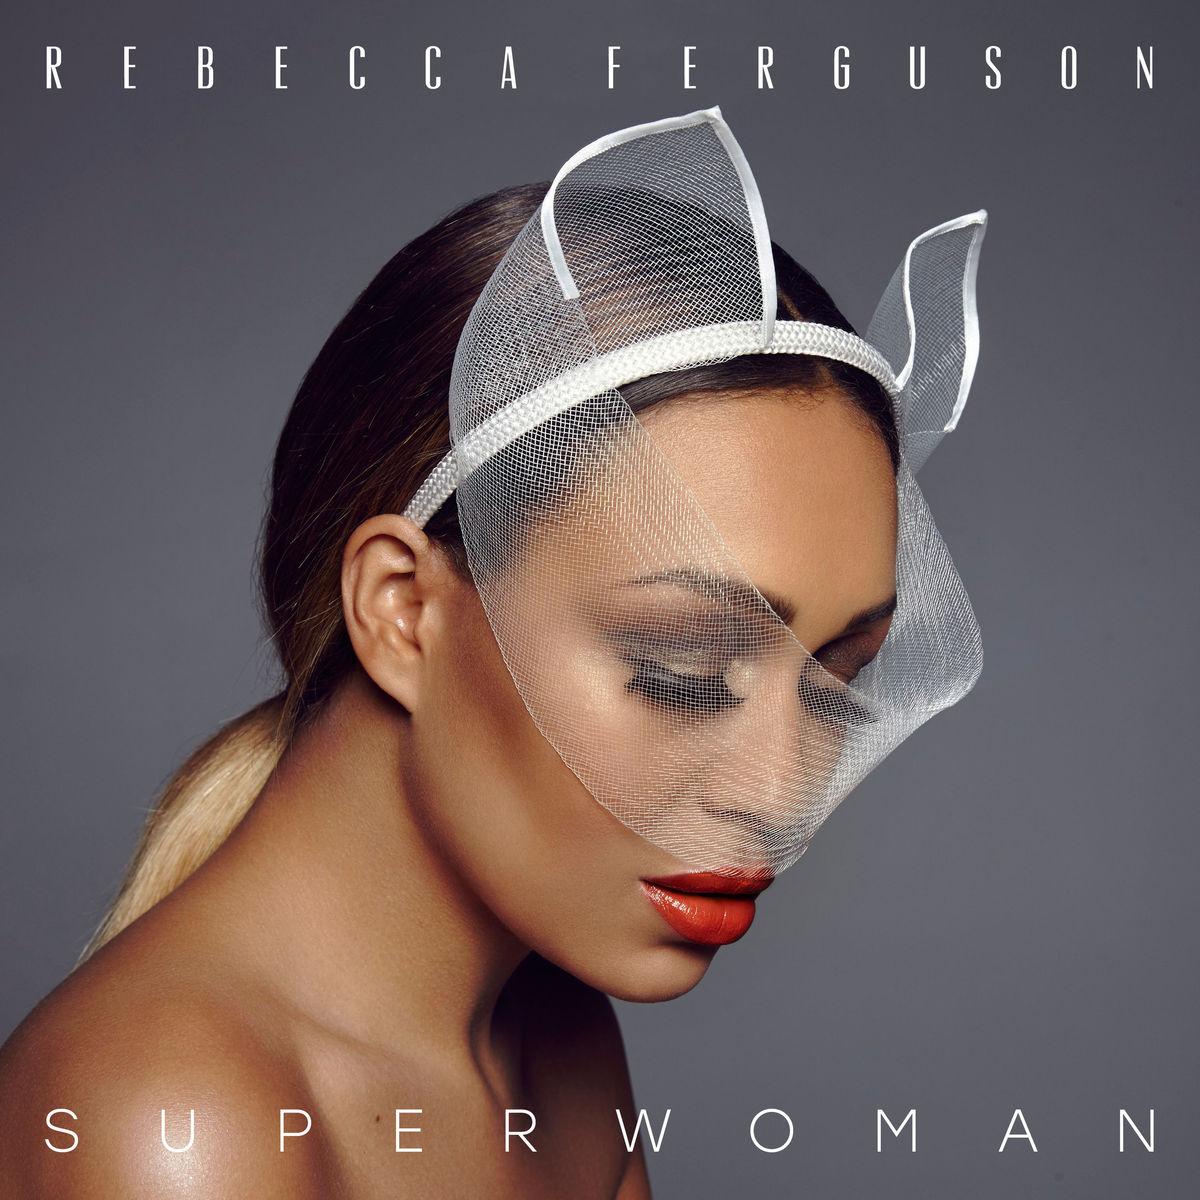 Articlehome rebecca ferguson superwoman 2016 2480x2480